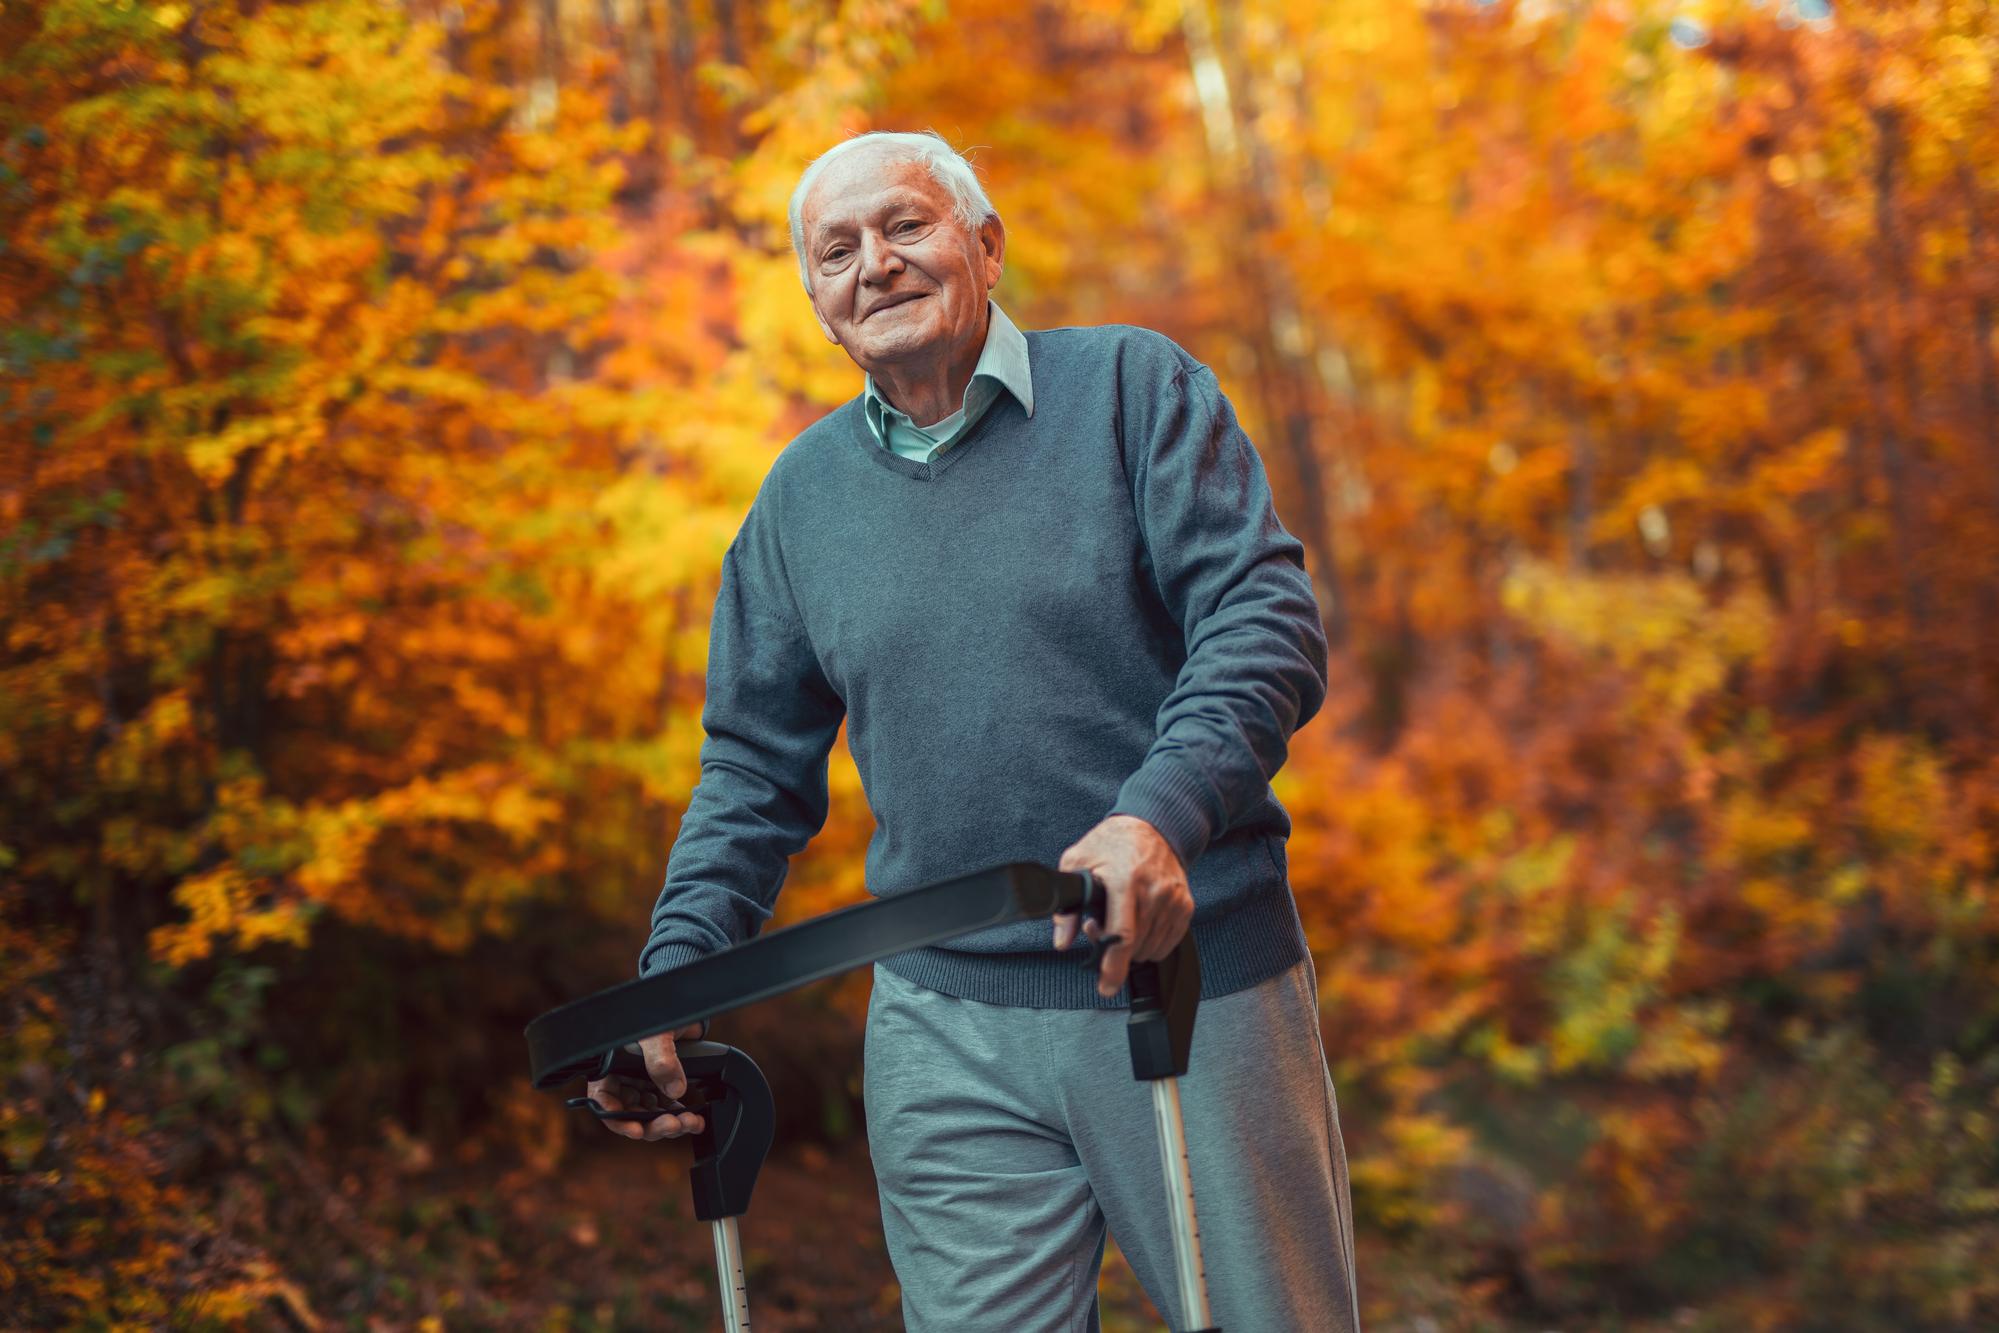 post-surgical-treatment-restores-activity